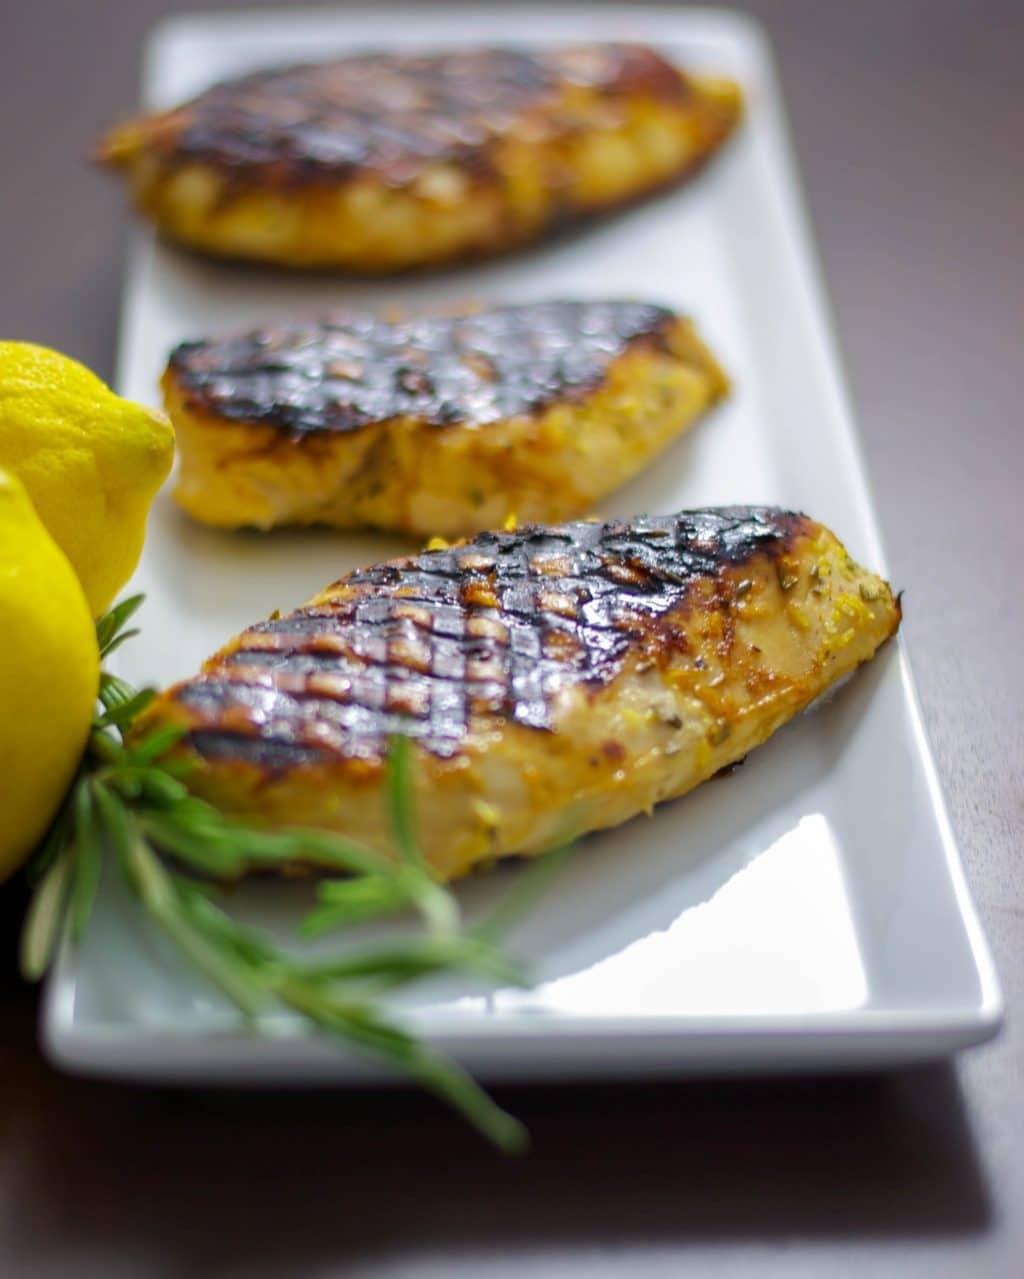 Honey Lemon Grilled Chicken Breast